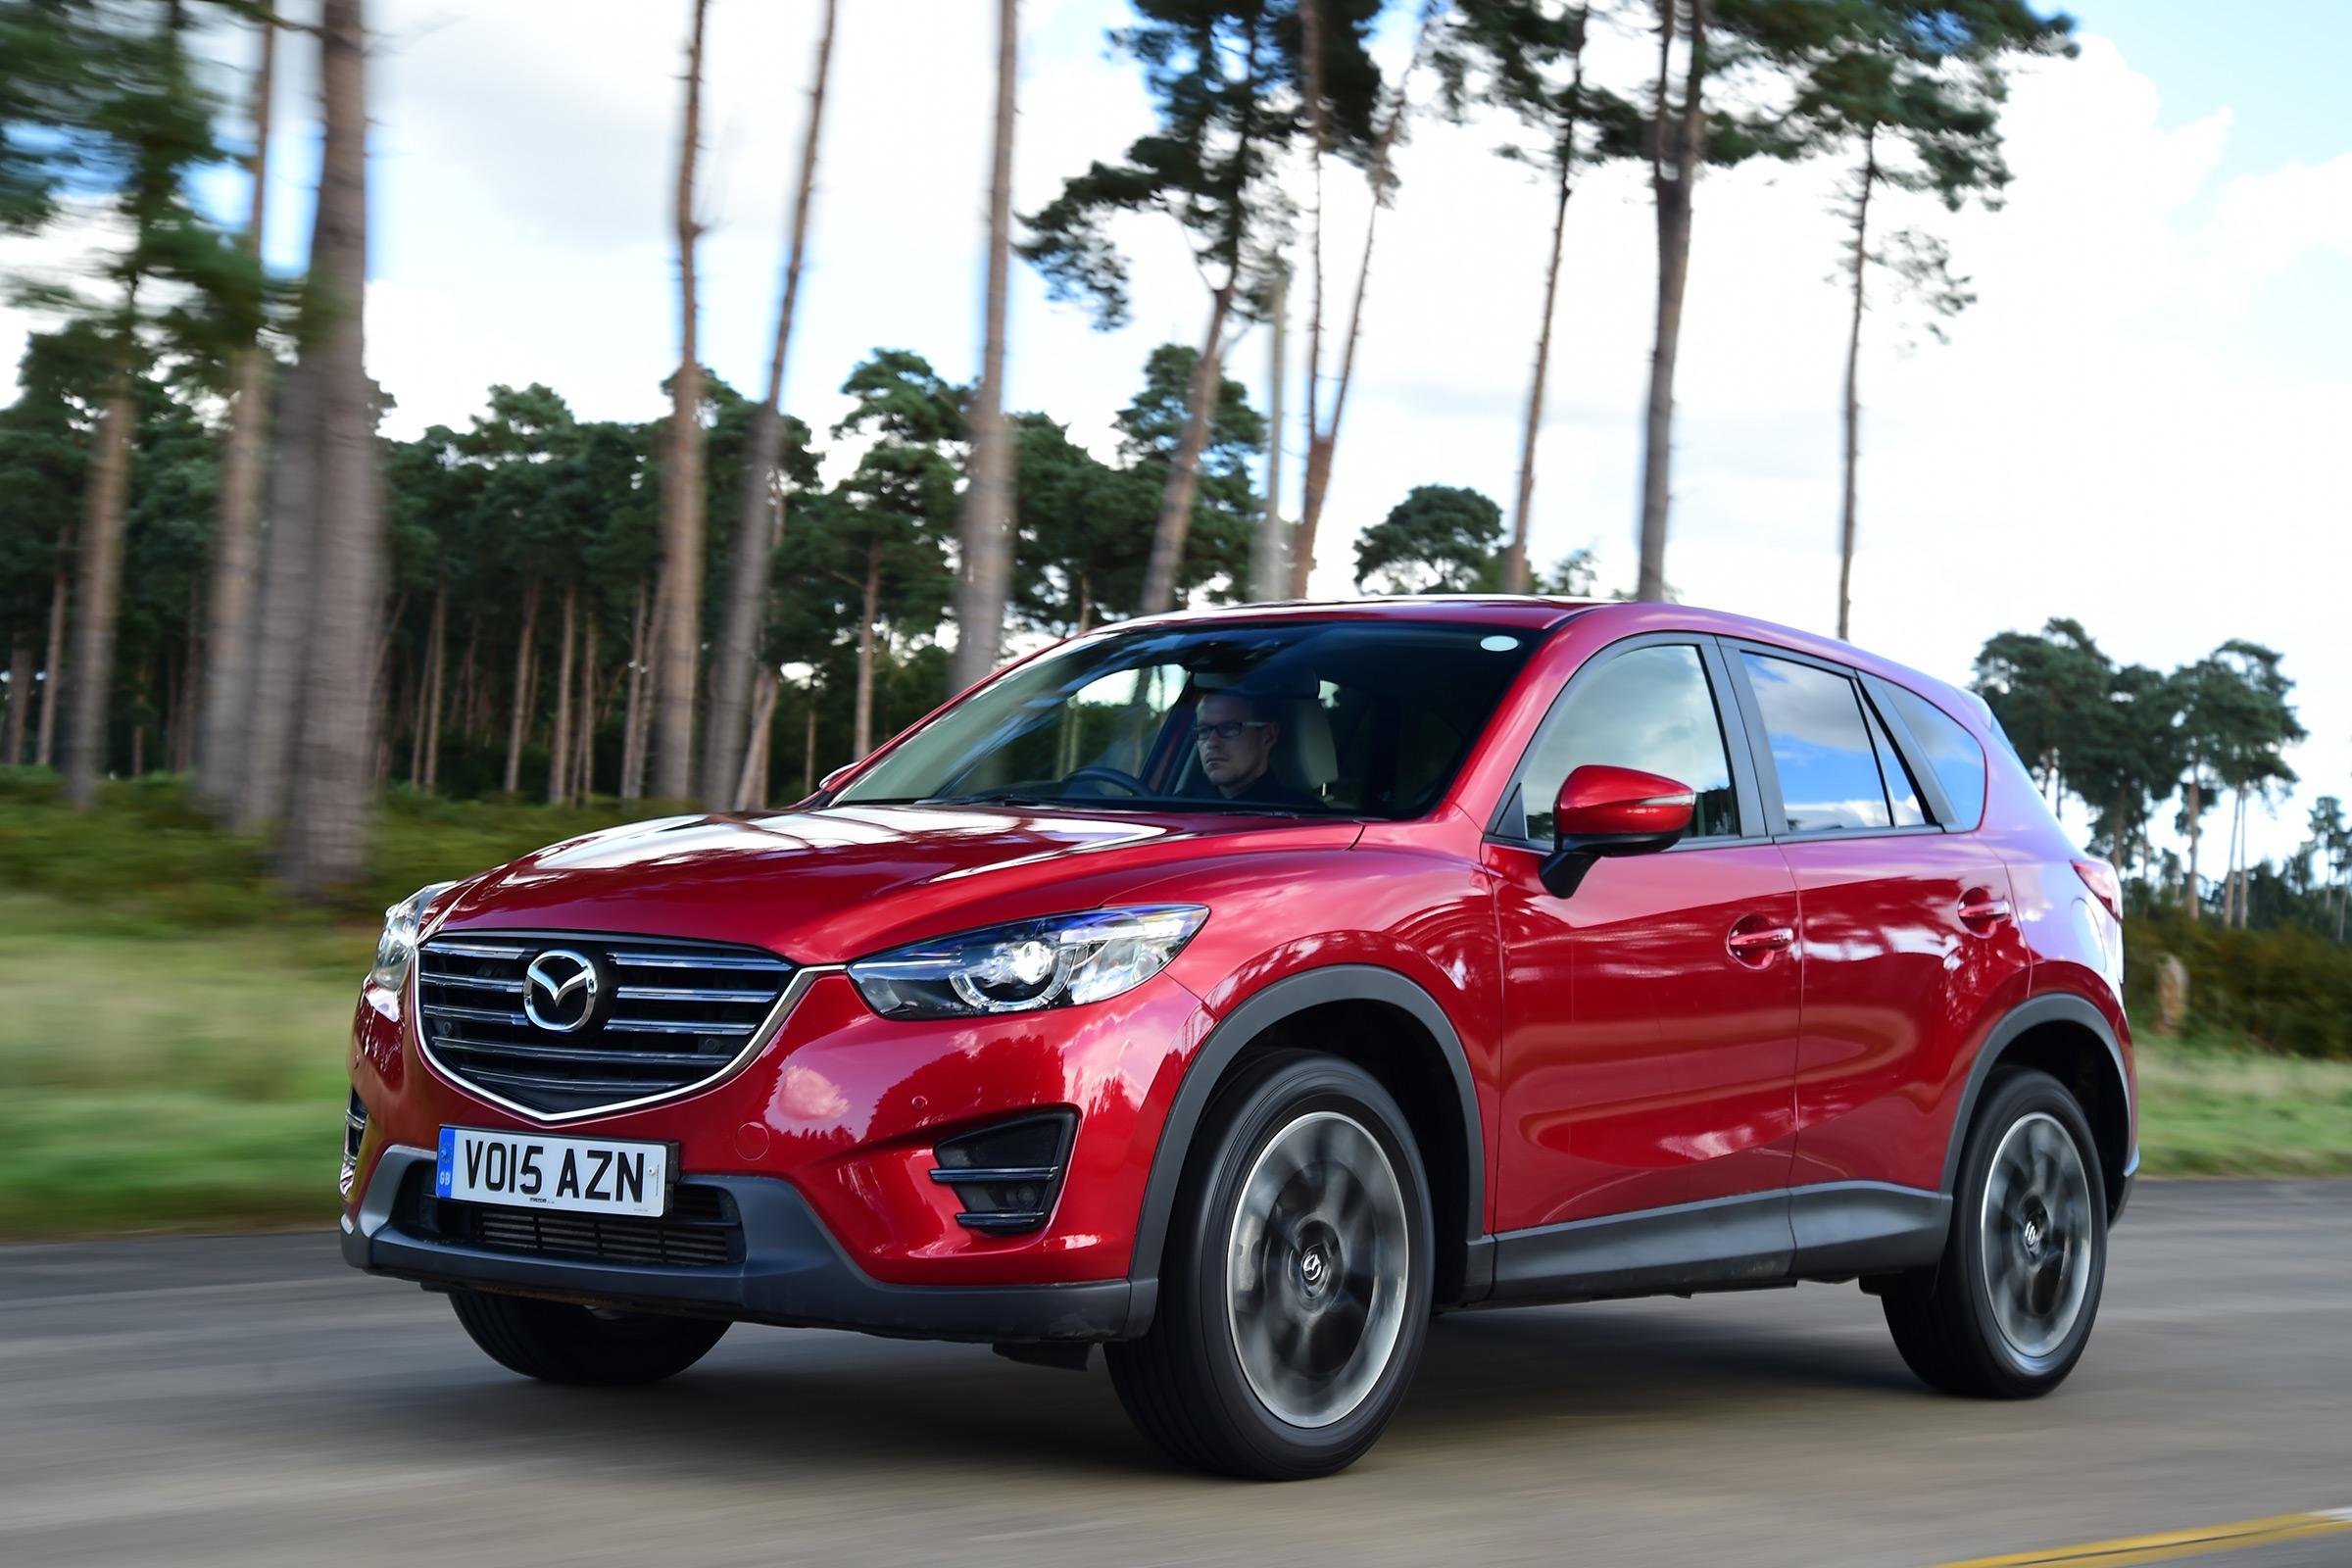 Kelebihan Mazda Cx 5 4X4 Review